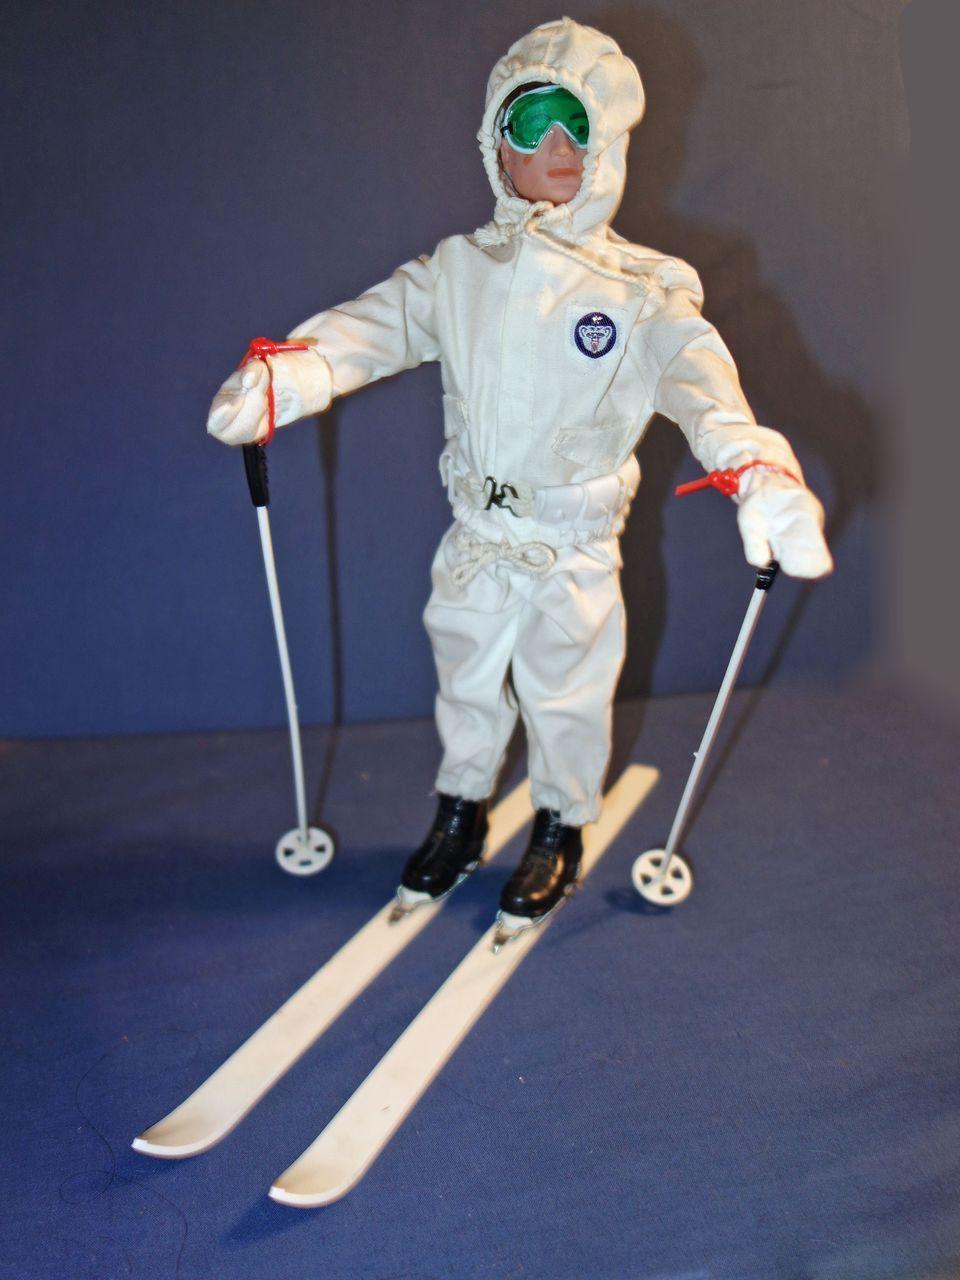 GI Joe Ski Patrol 1960's Gi joe, Skiing, Vintage ski